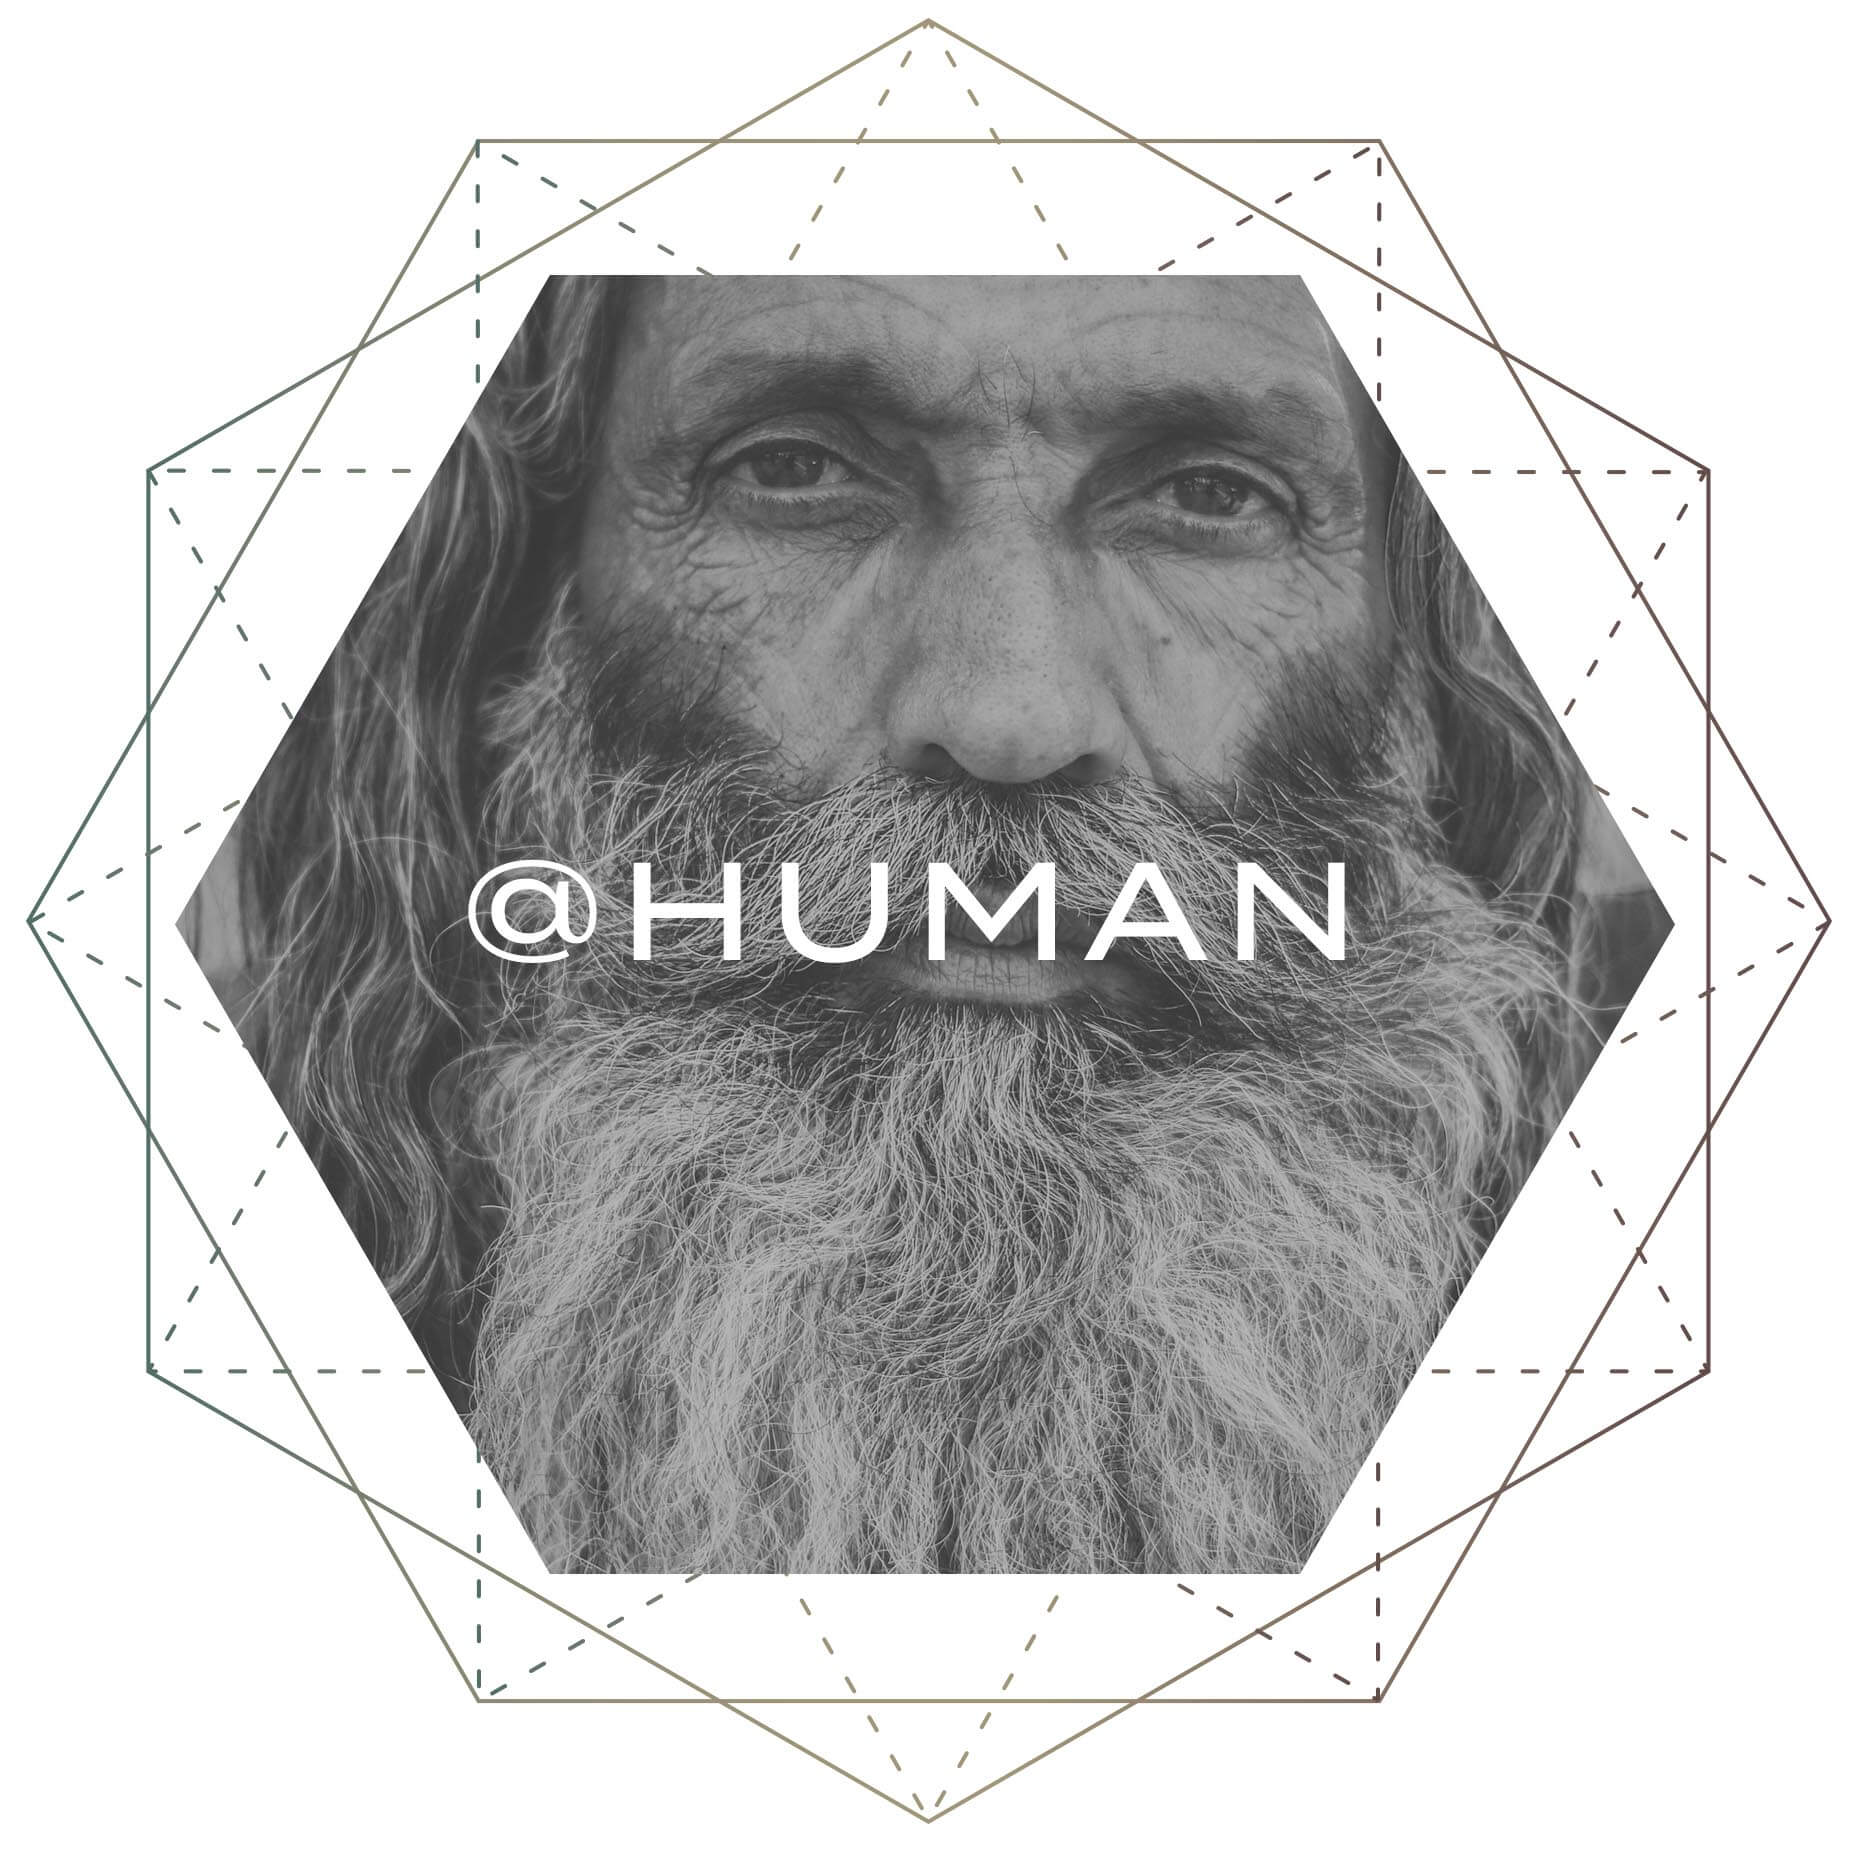 Humans-4-1